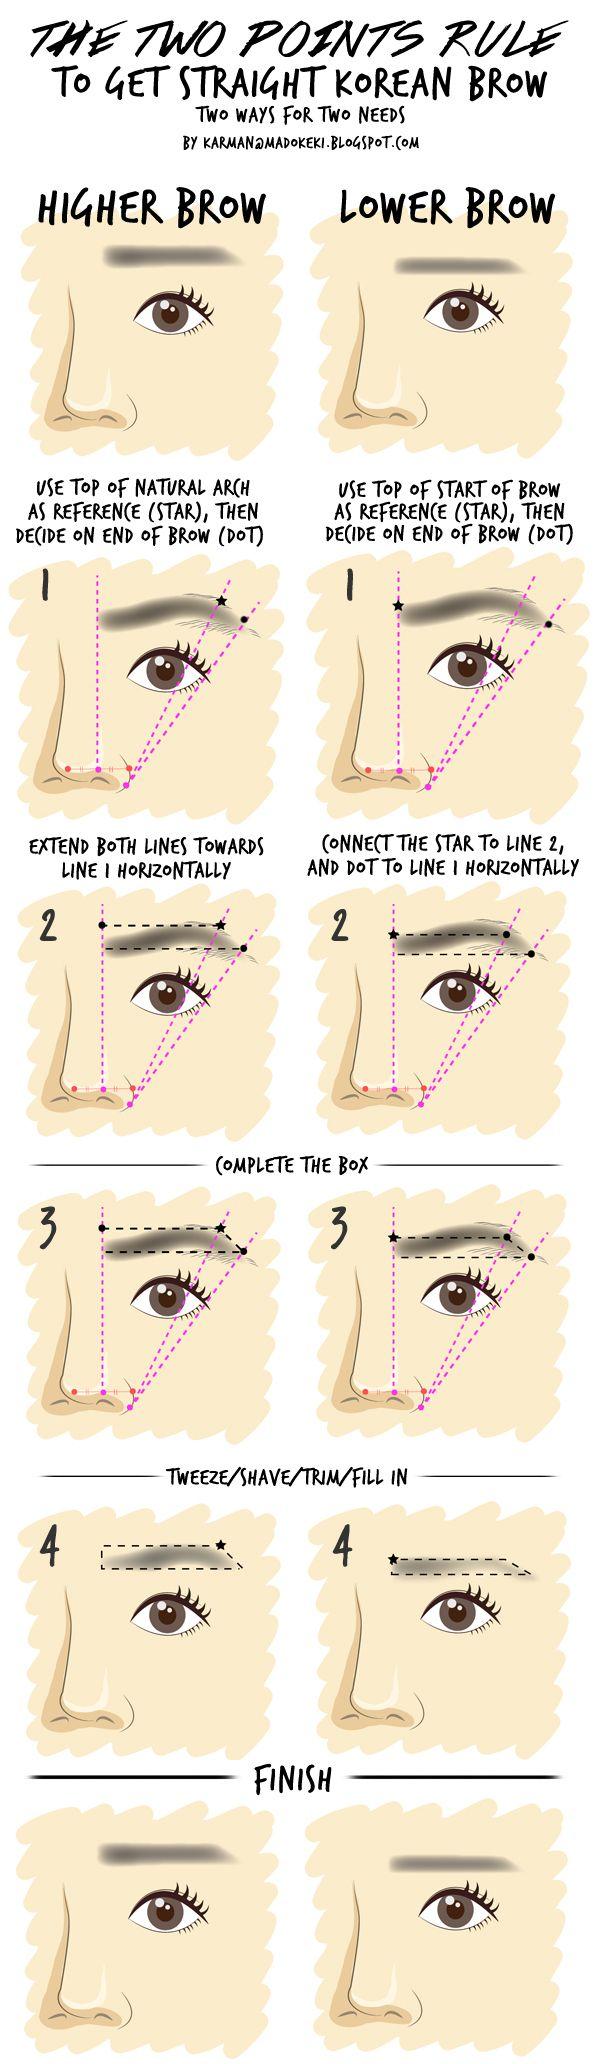 How To Shape And Groom Eyebrow For Beginners Madokeki Makeup